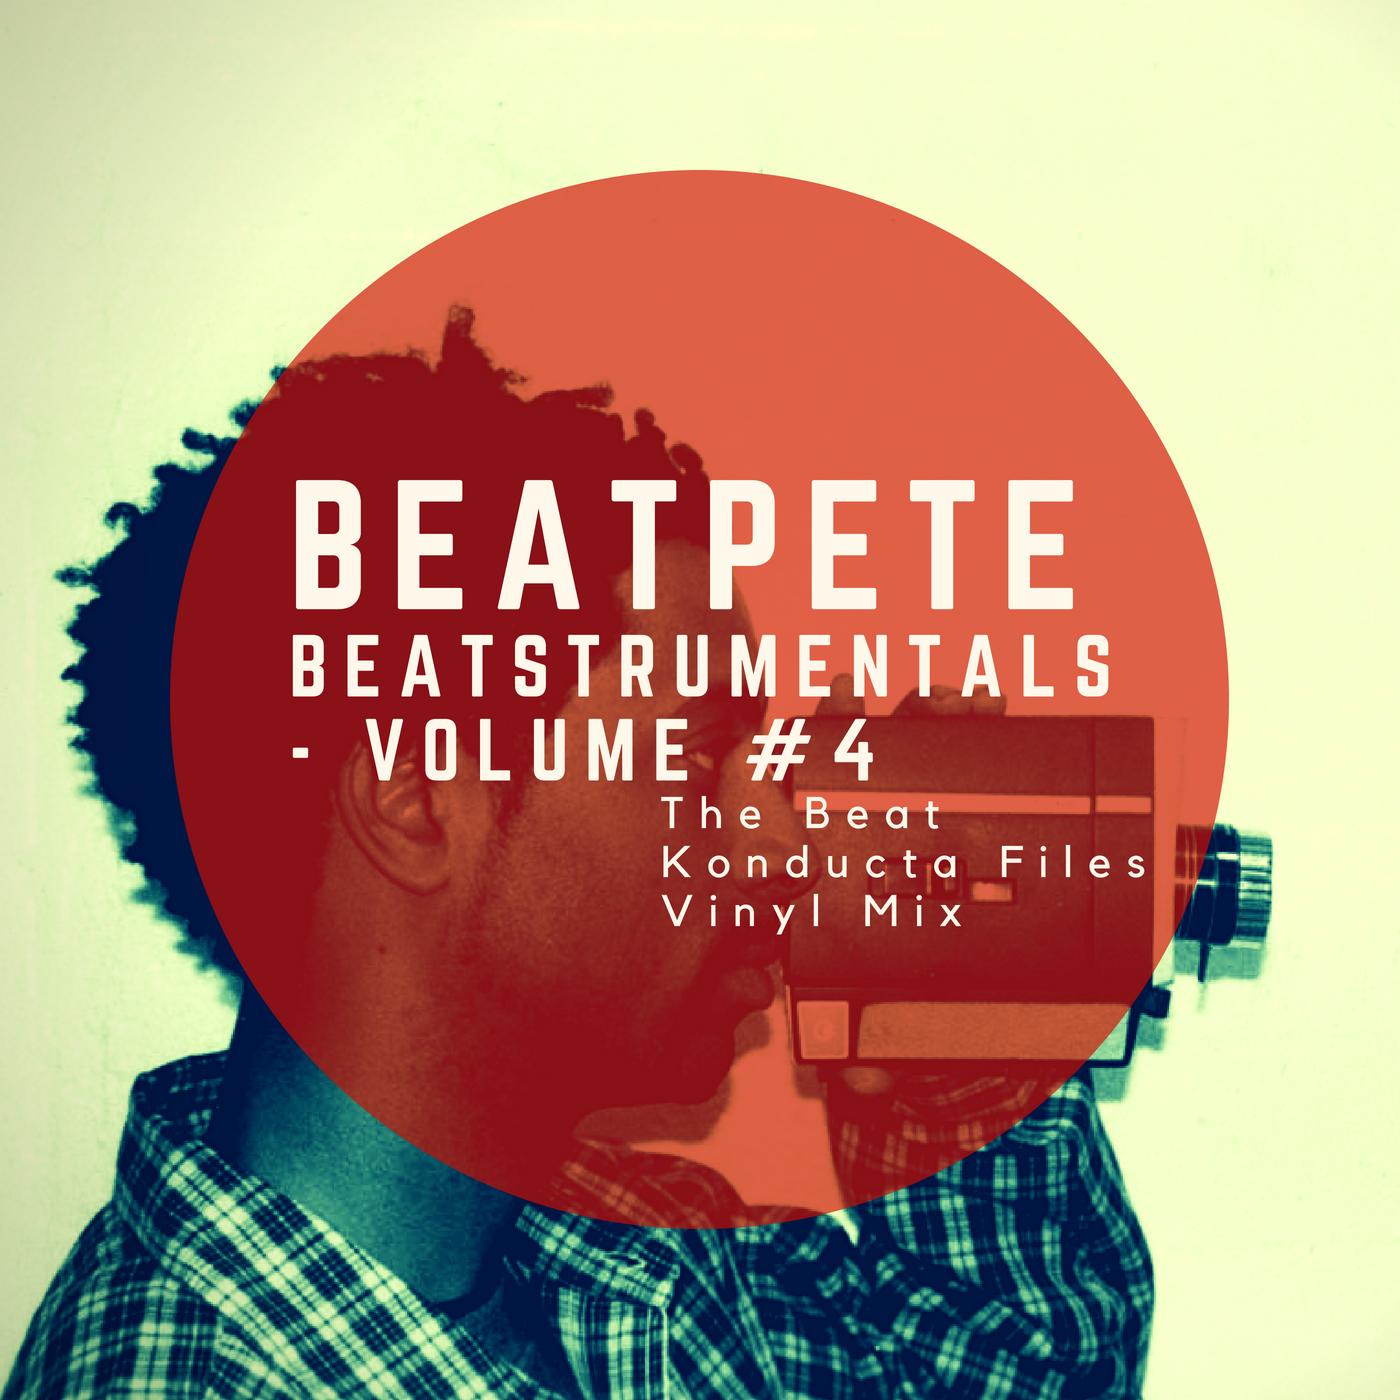 BEATPETE - BEATSTRUMENTALS | VOLUME #4 - MADLIB VINYL MIX | STREAM